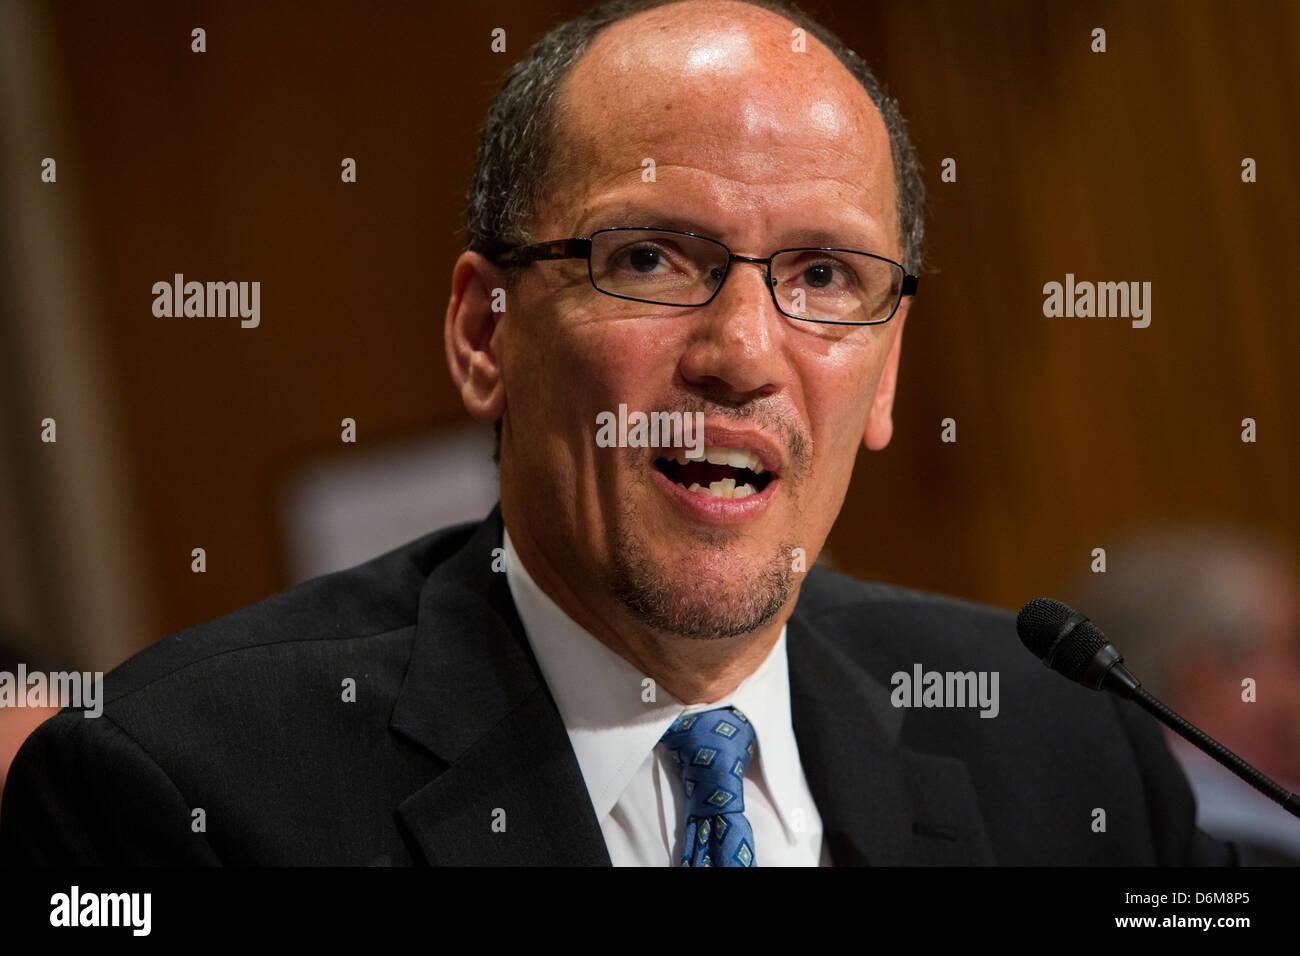 United States Secretary of Labor Thomas Perez during his Senate confirmation hearing.  - Stock Image